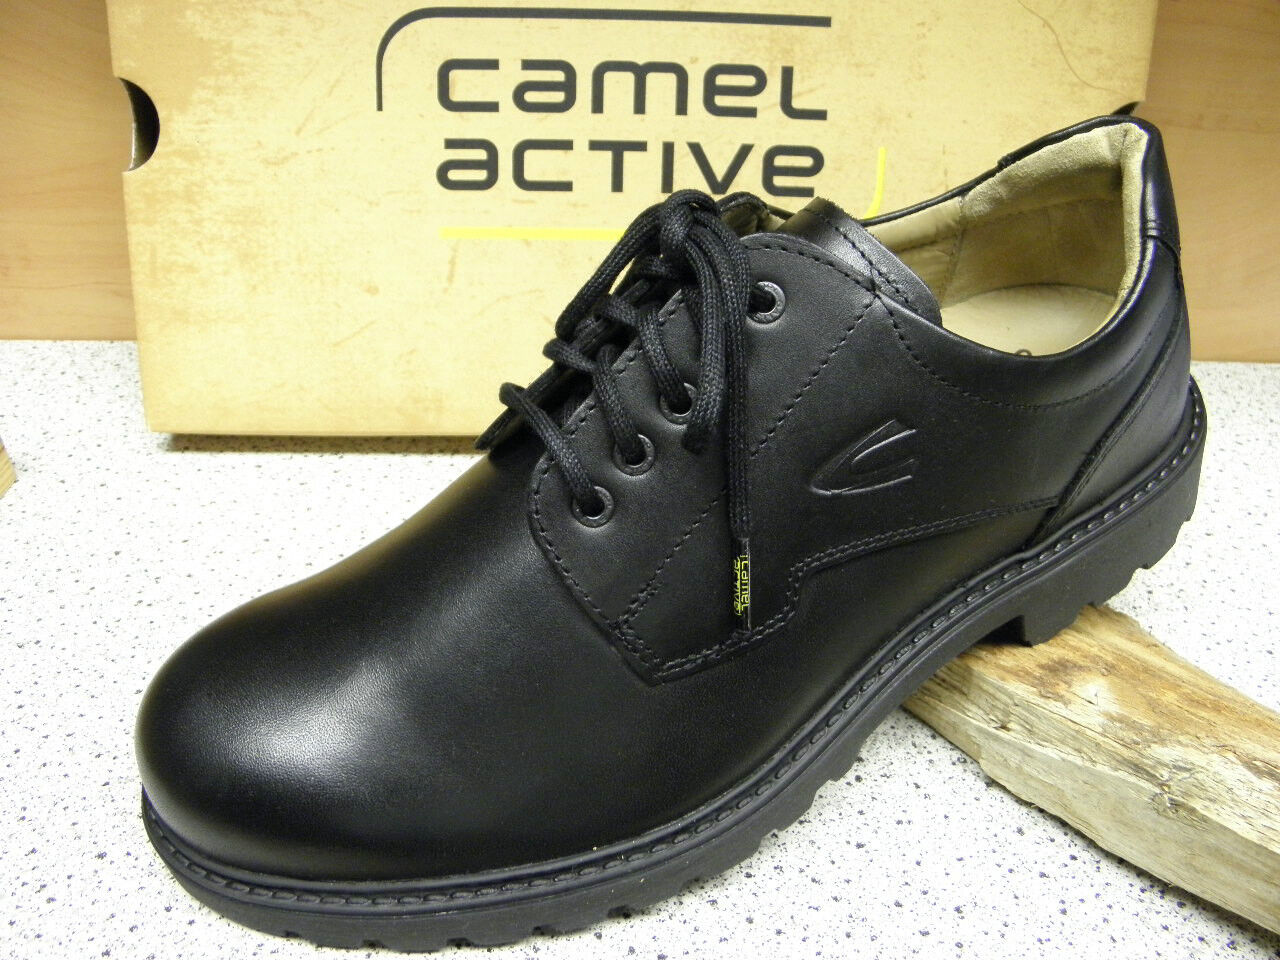 Camel Active ® (C24) reduziert  Outback Negro Lederfutter 400.11.01 (C24) ® Gr. 41 27ffdb